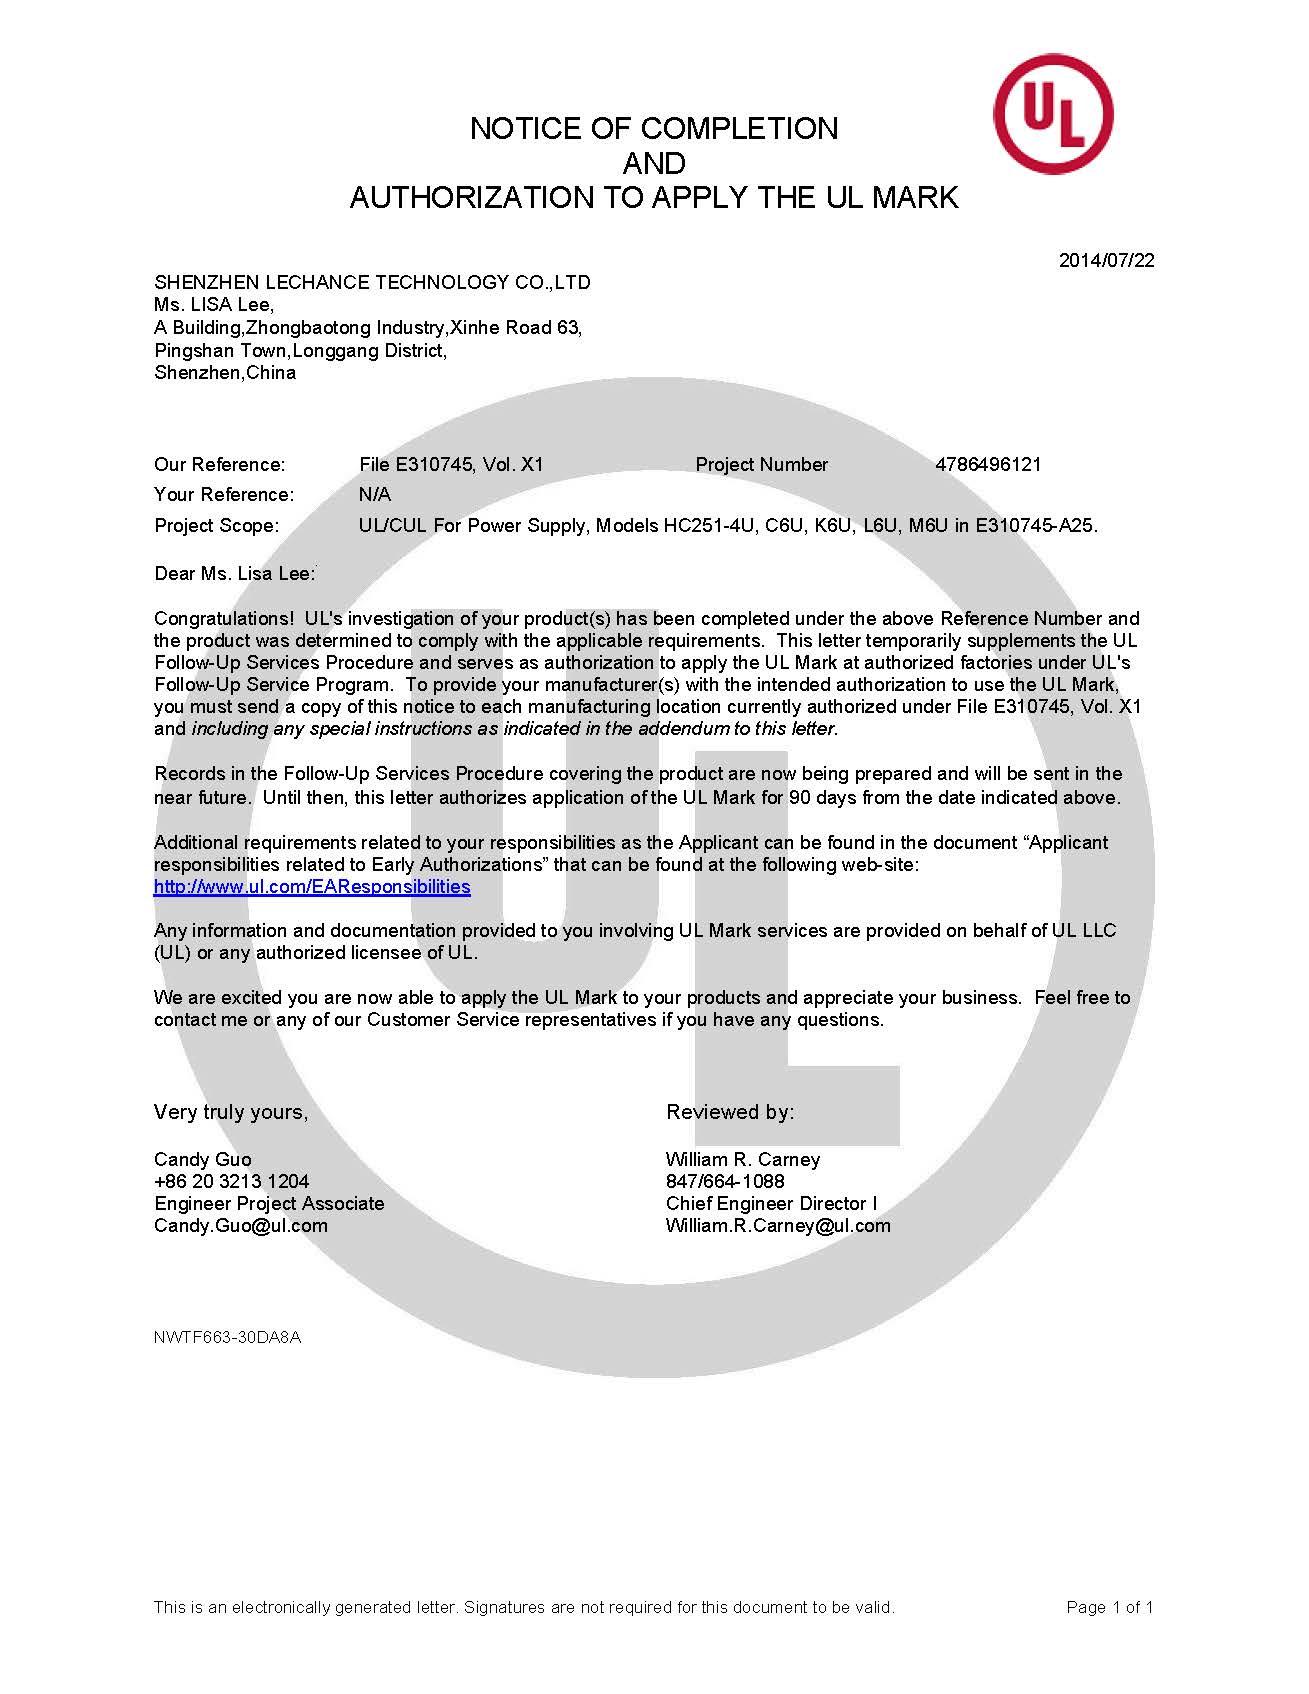 UL Certificate of LCK-LU10